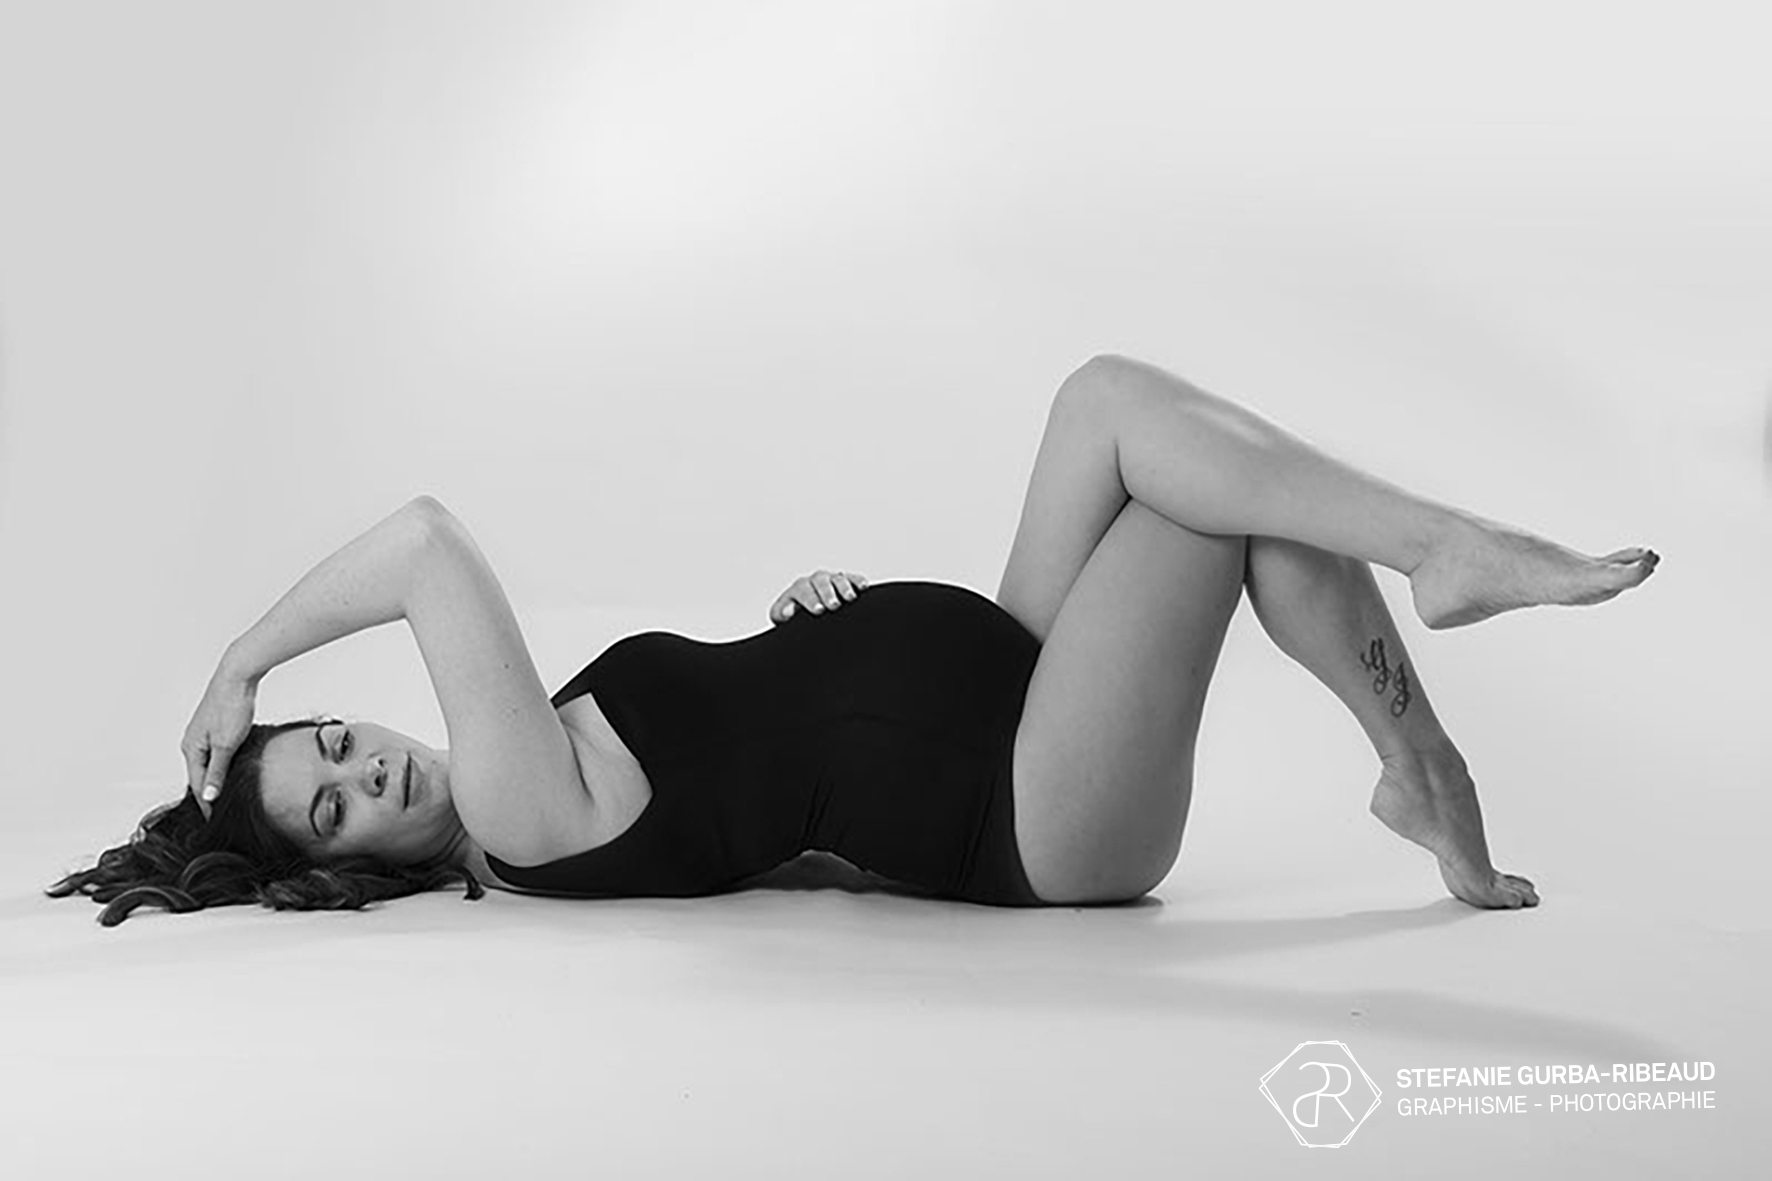 Stefanie Gurba Ribeaud - ASPPNN